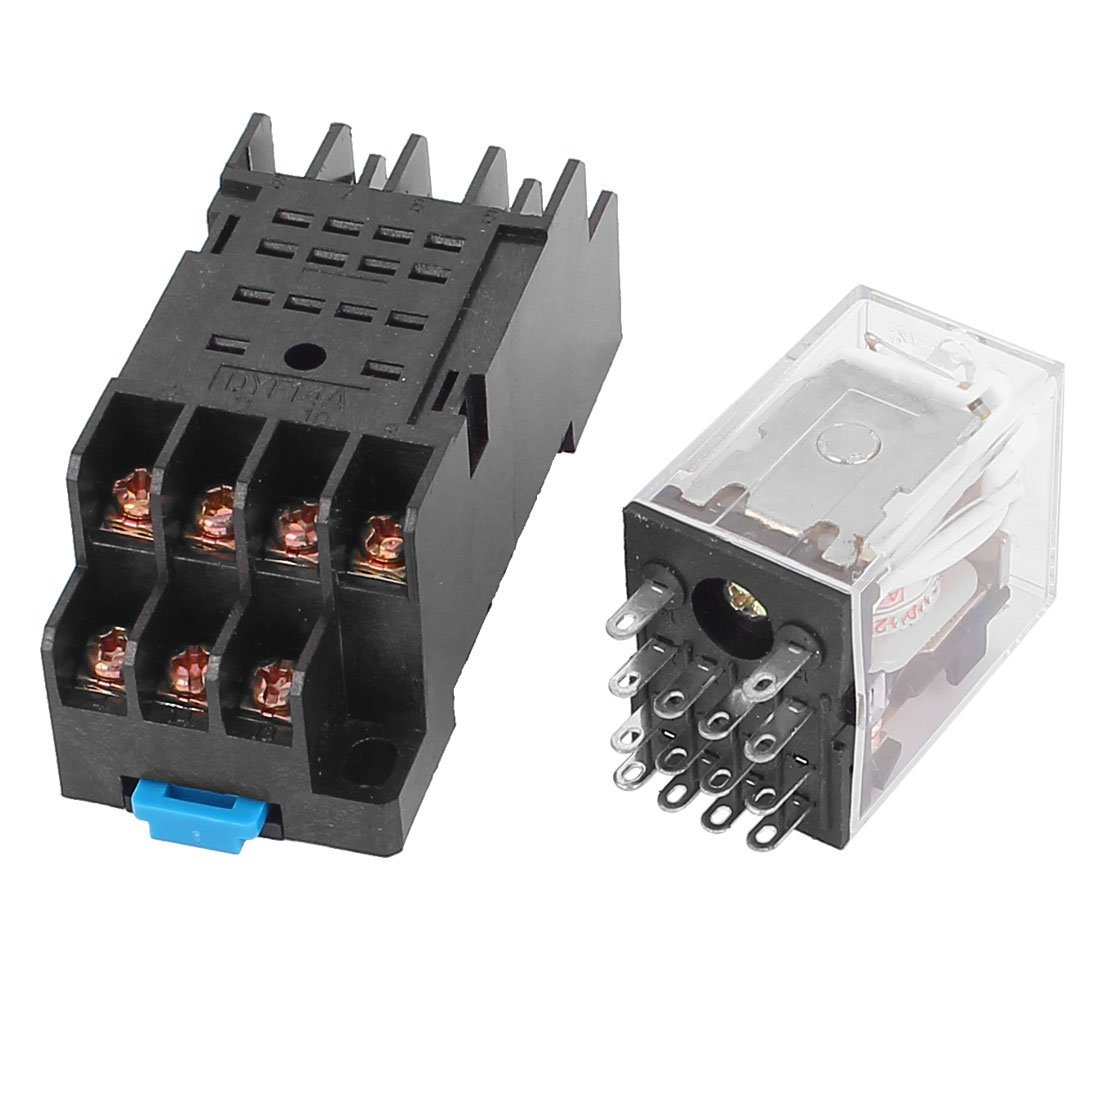 sourcingmap® HH54P-L AC 110/120V Relé de alimentación bobina 14pines 4PDT Carril DIN de 35 mm rojo w Toma de la luz uxcell US-SA-AJD-160961